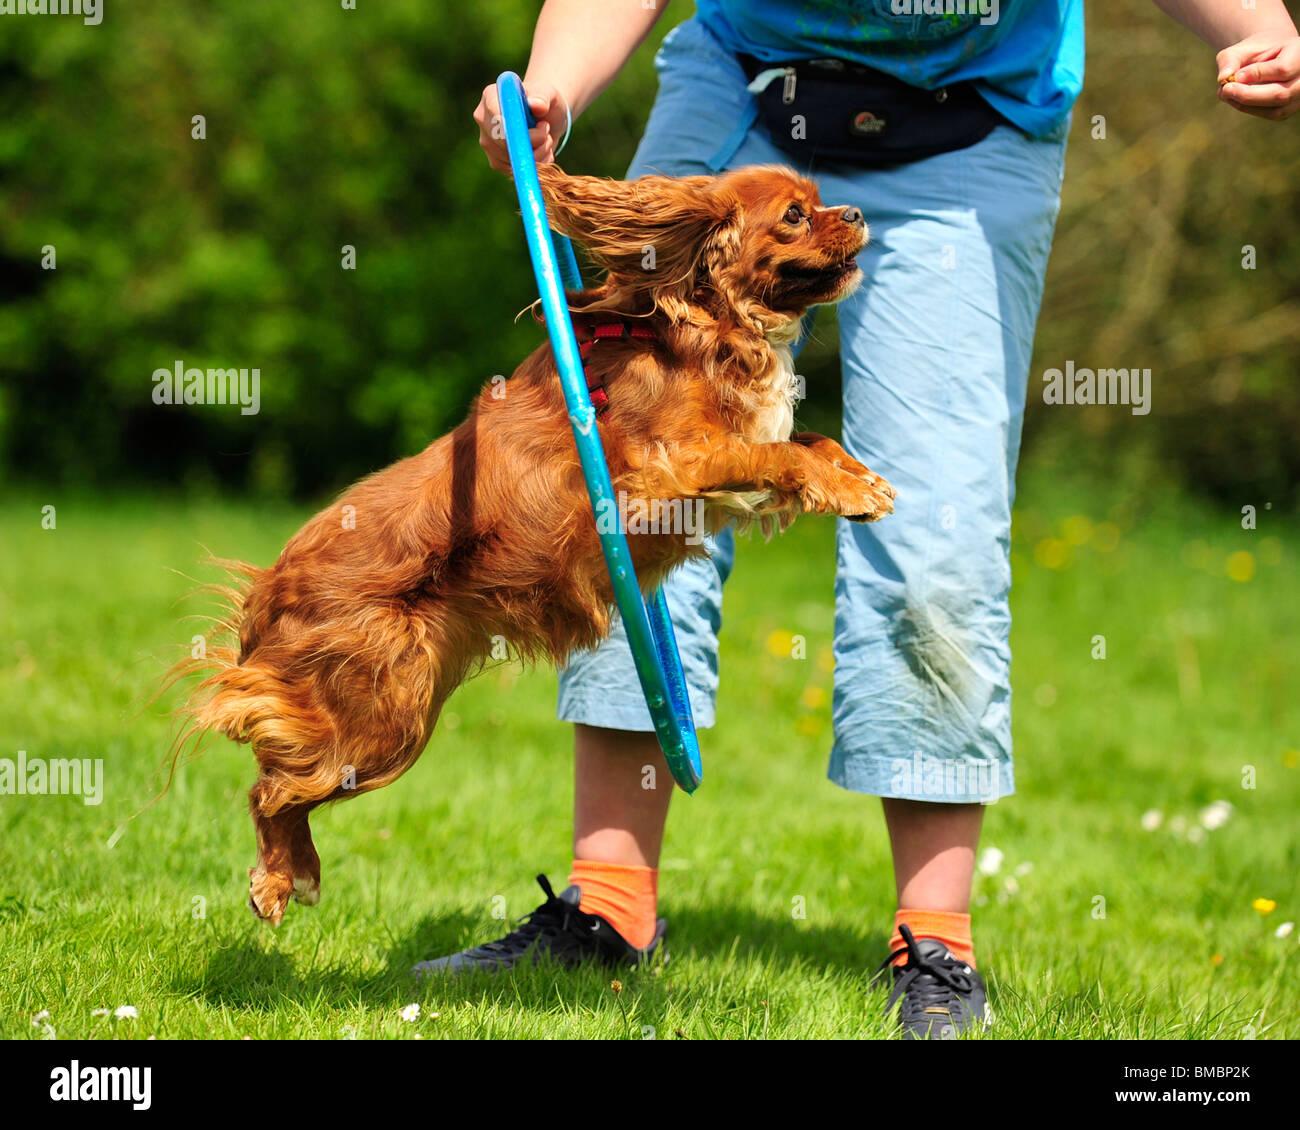 cavalier king charles spaniel jumping through a hoop - Stock Image